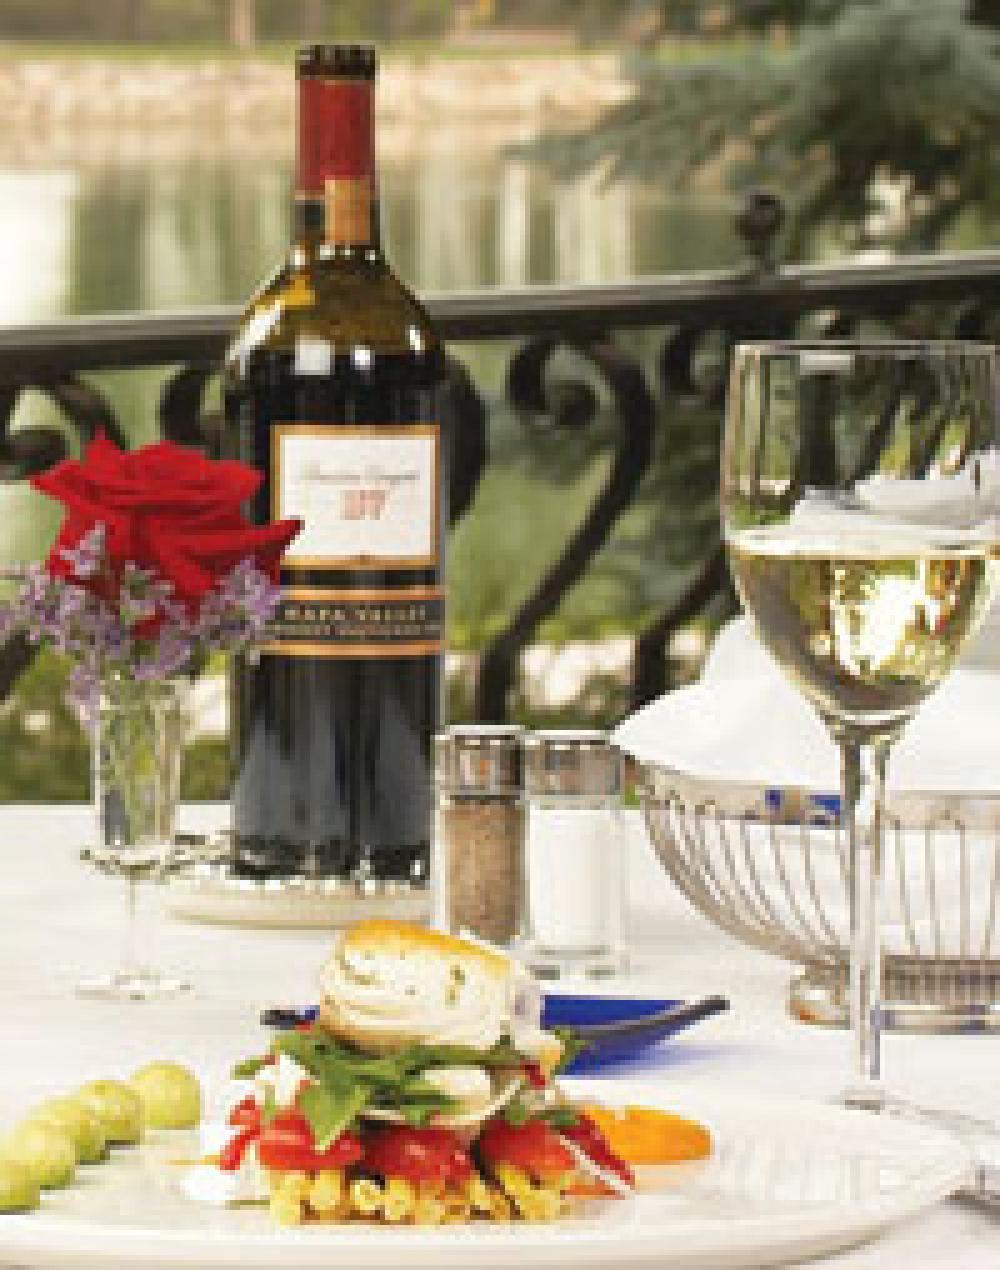 Budget-wary travelers' summer plans concern U.S. dining destinations